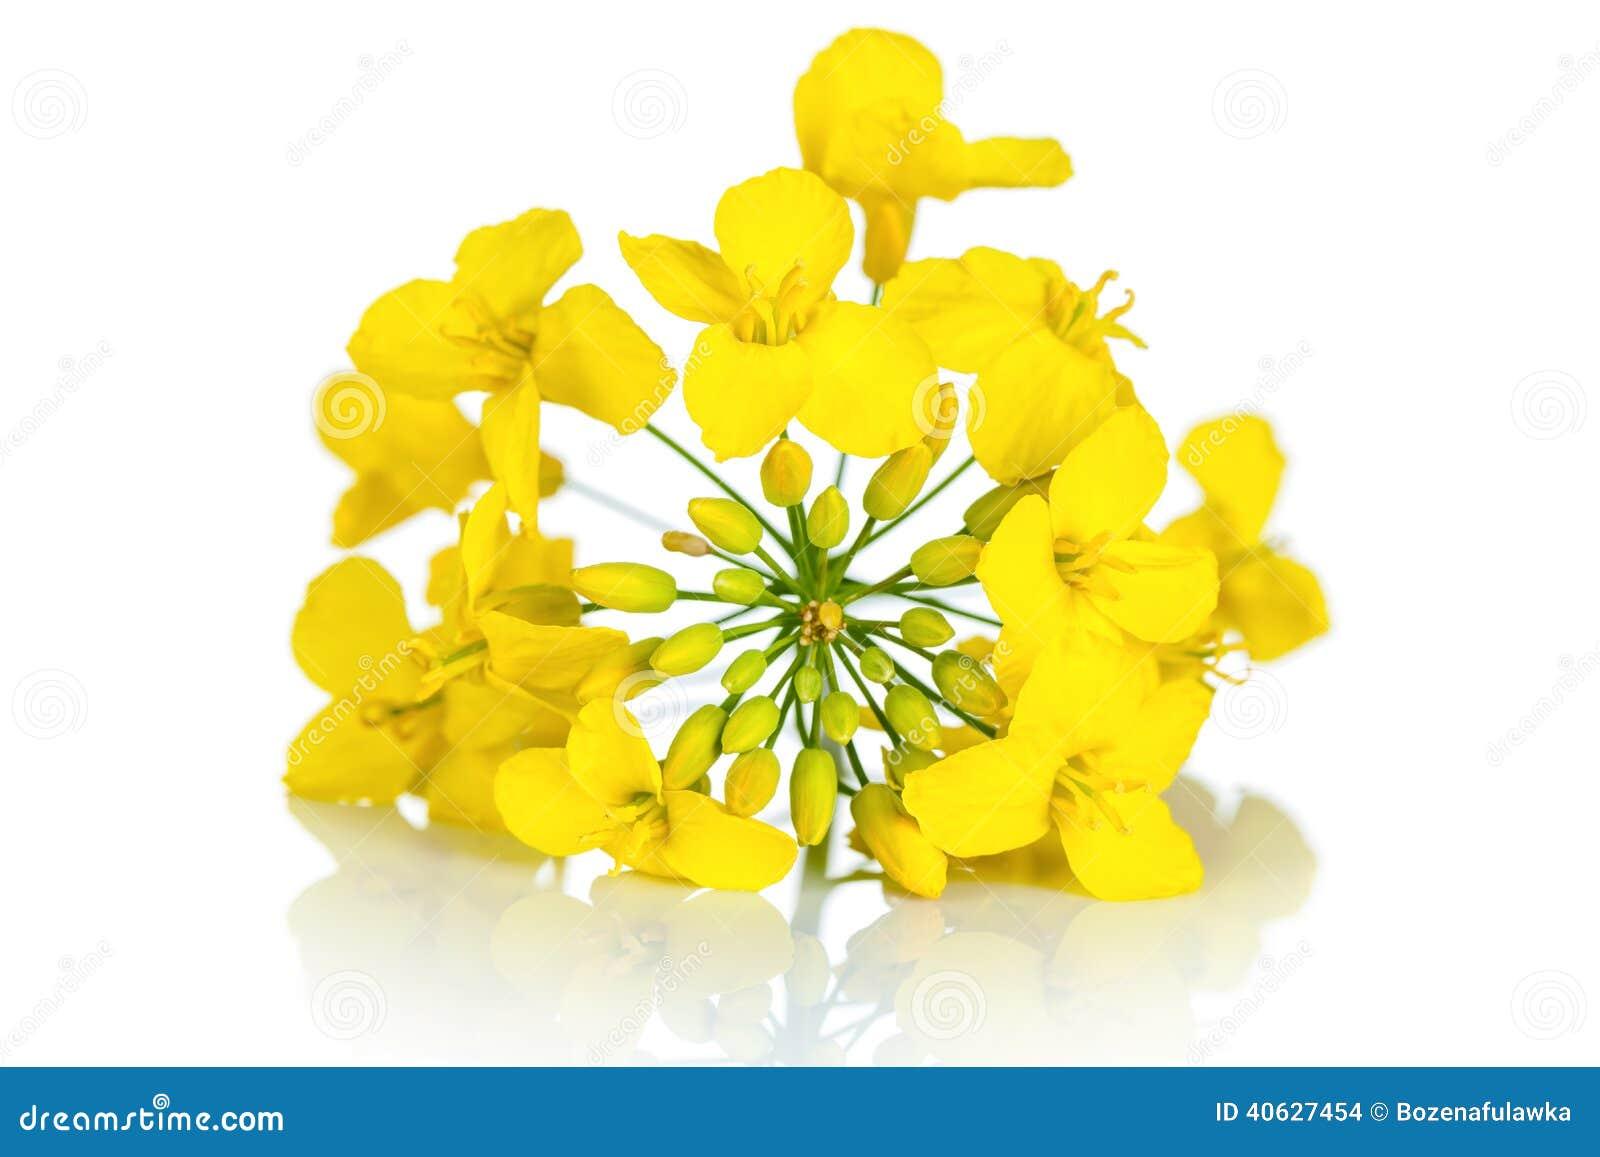 fleur de graine de colza photo stock image 40627454. Black Bedroom Furniture Sets. Home Design Ideas